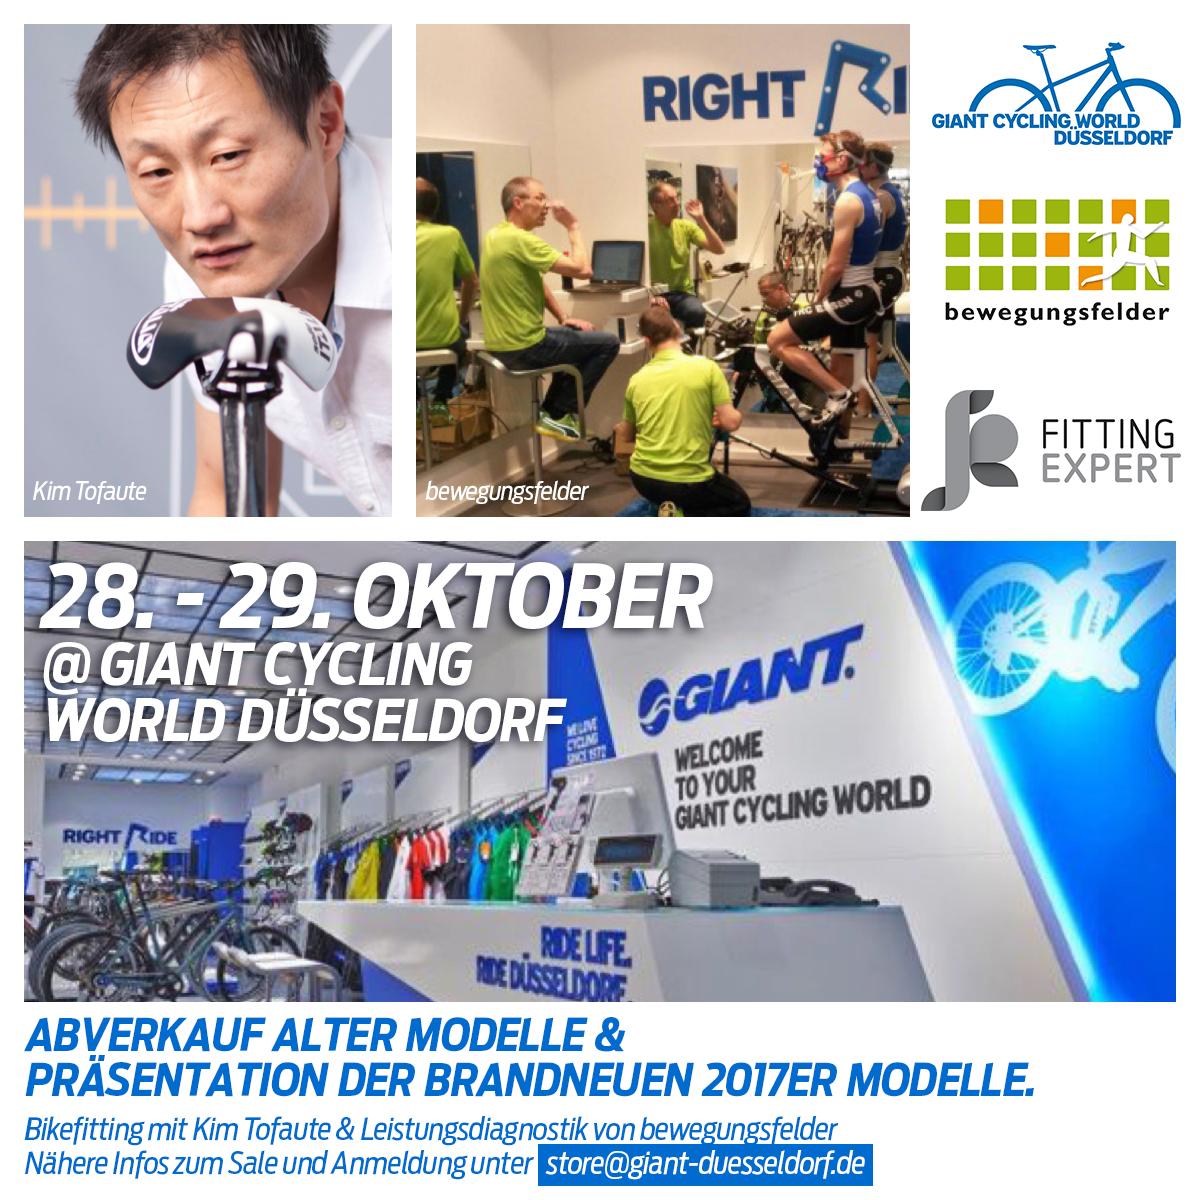 bewegungsfelder on Tour: Giant Düsseldorf